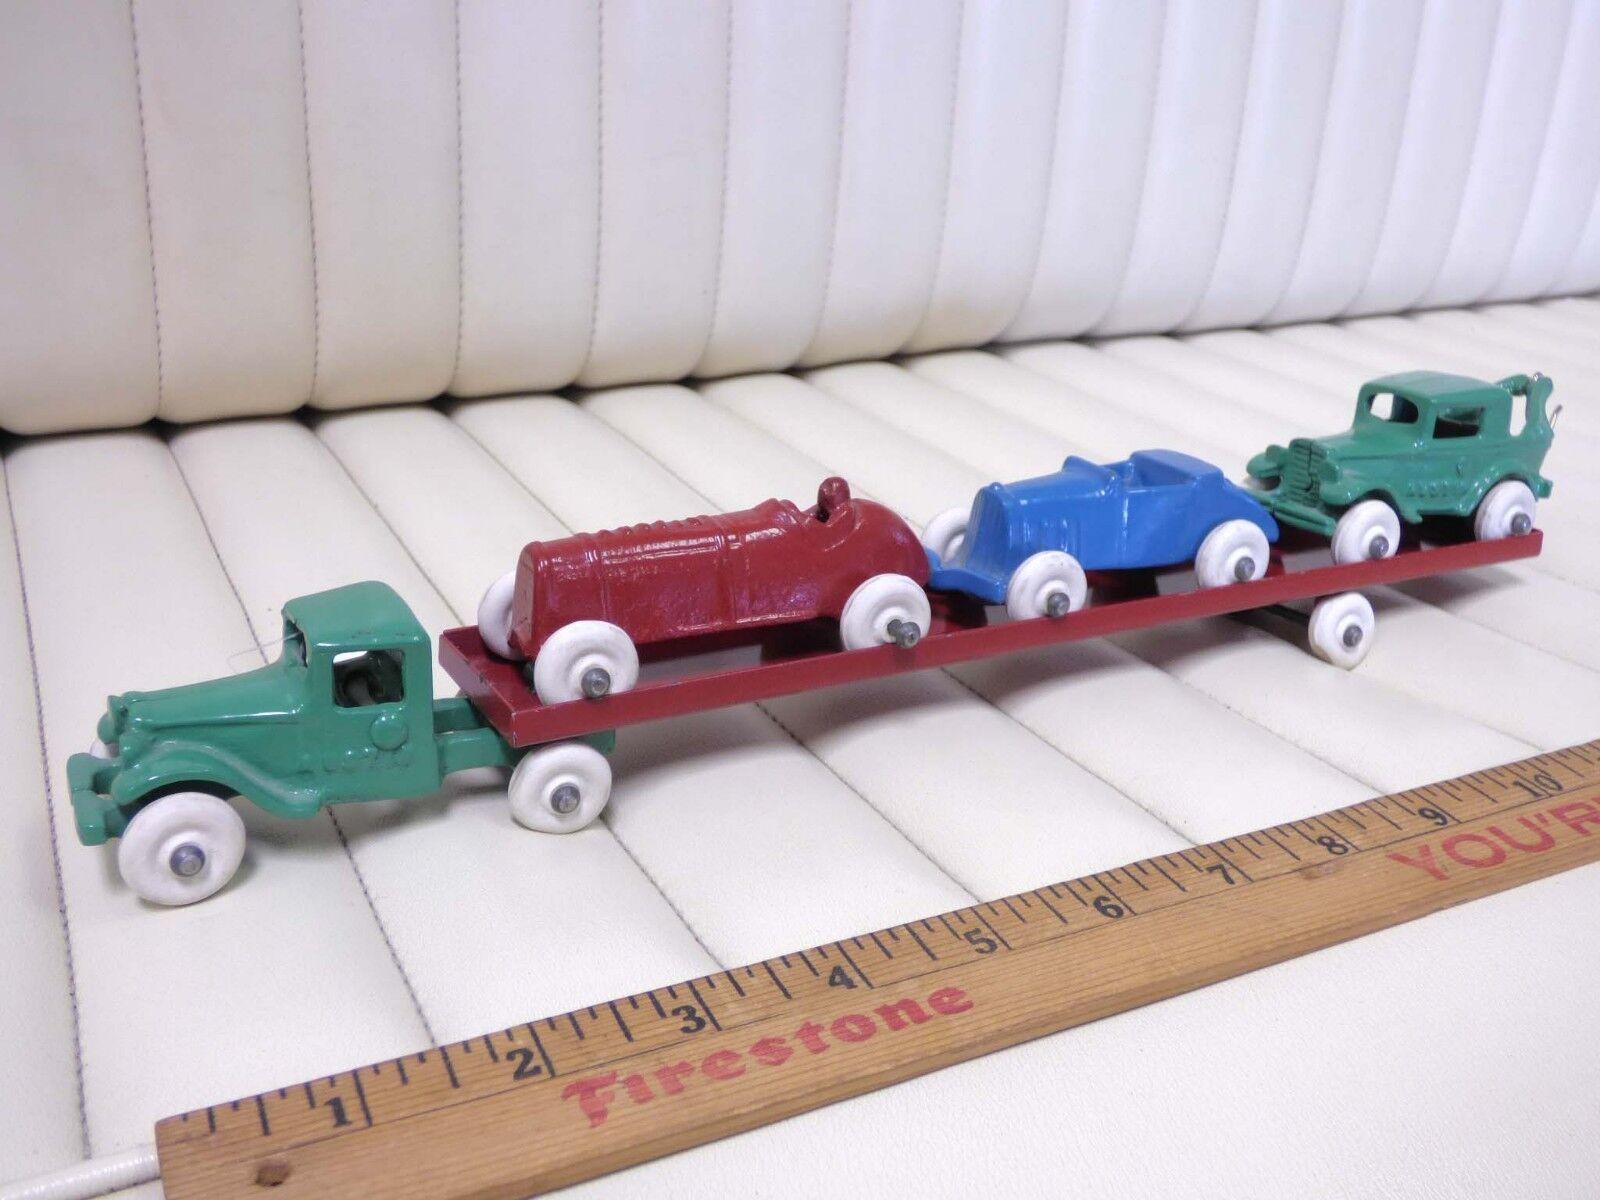 1931 -34 ARCADE (-AUSTIN bil Tjärnväger Transport set w   3 bilS Cast Iron leksak)